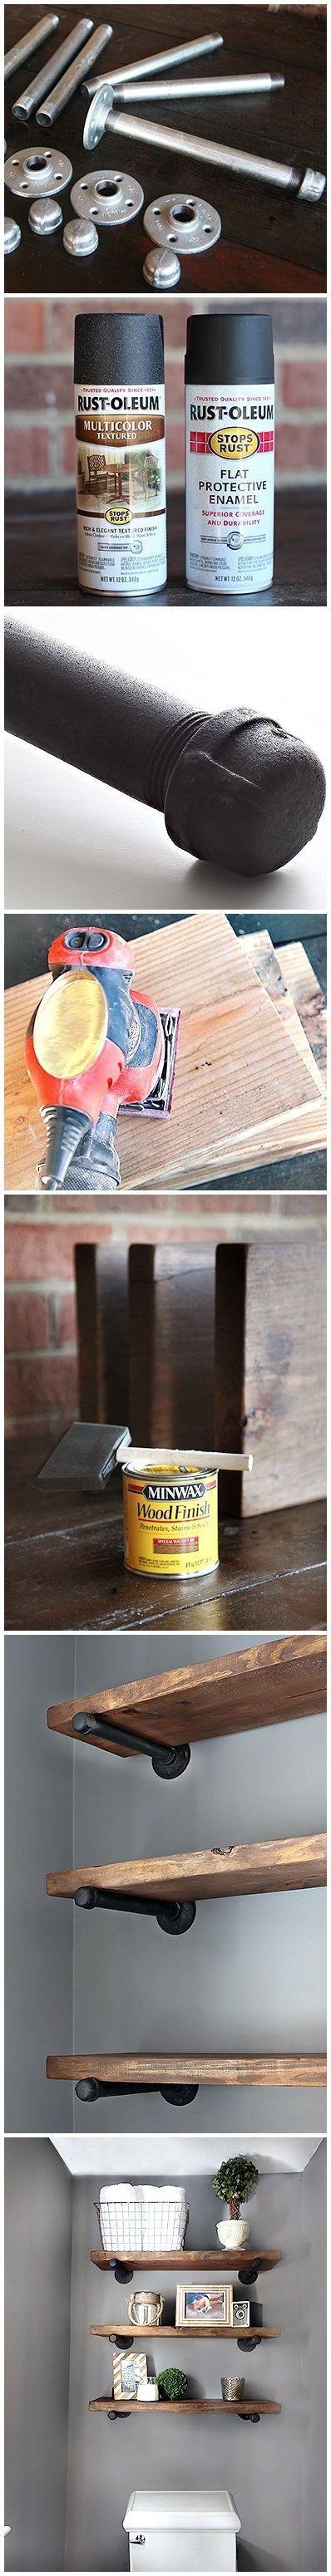 DIY Restoration Hardware - Inspired Shelving